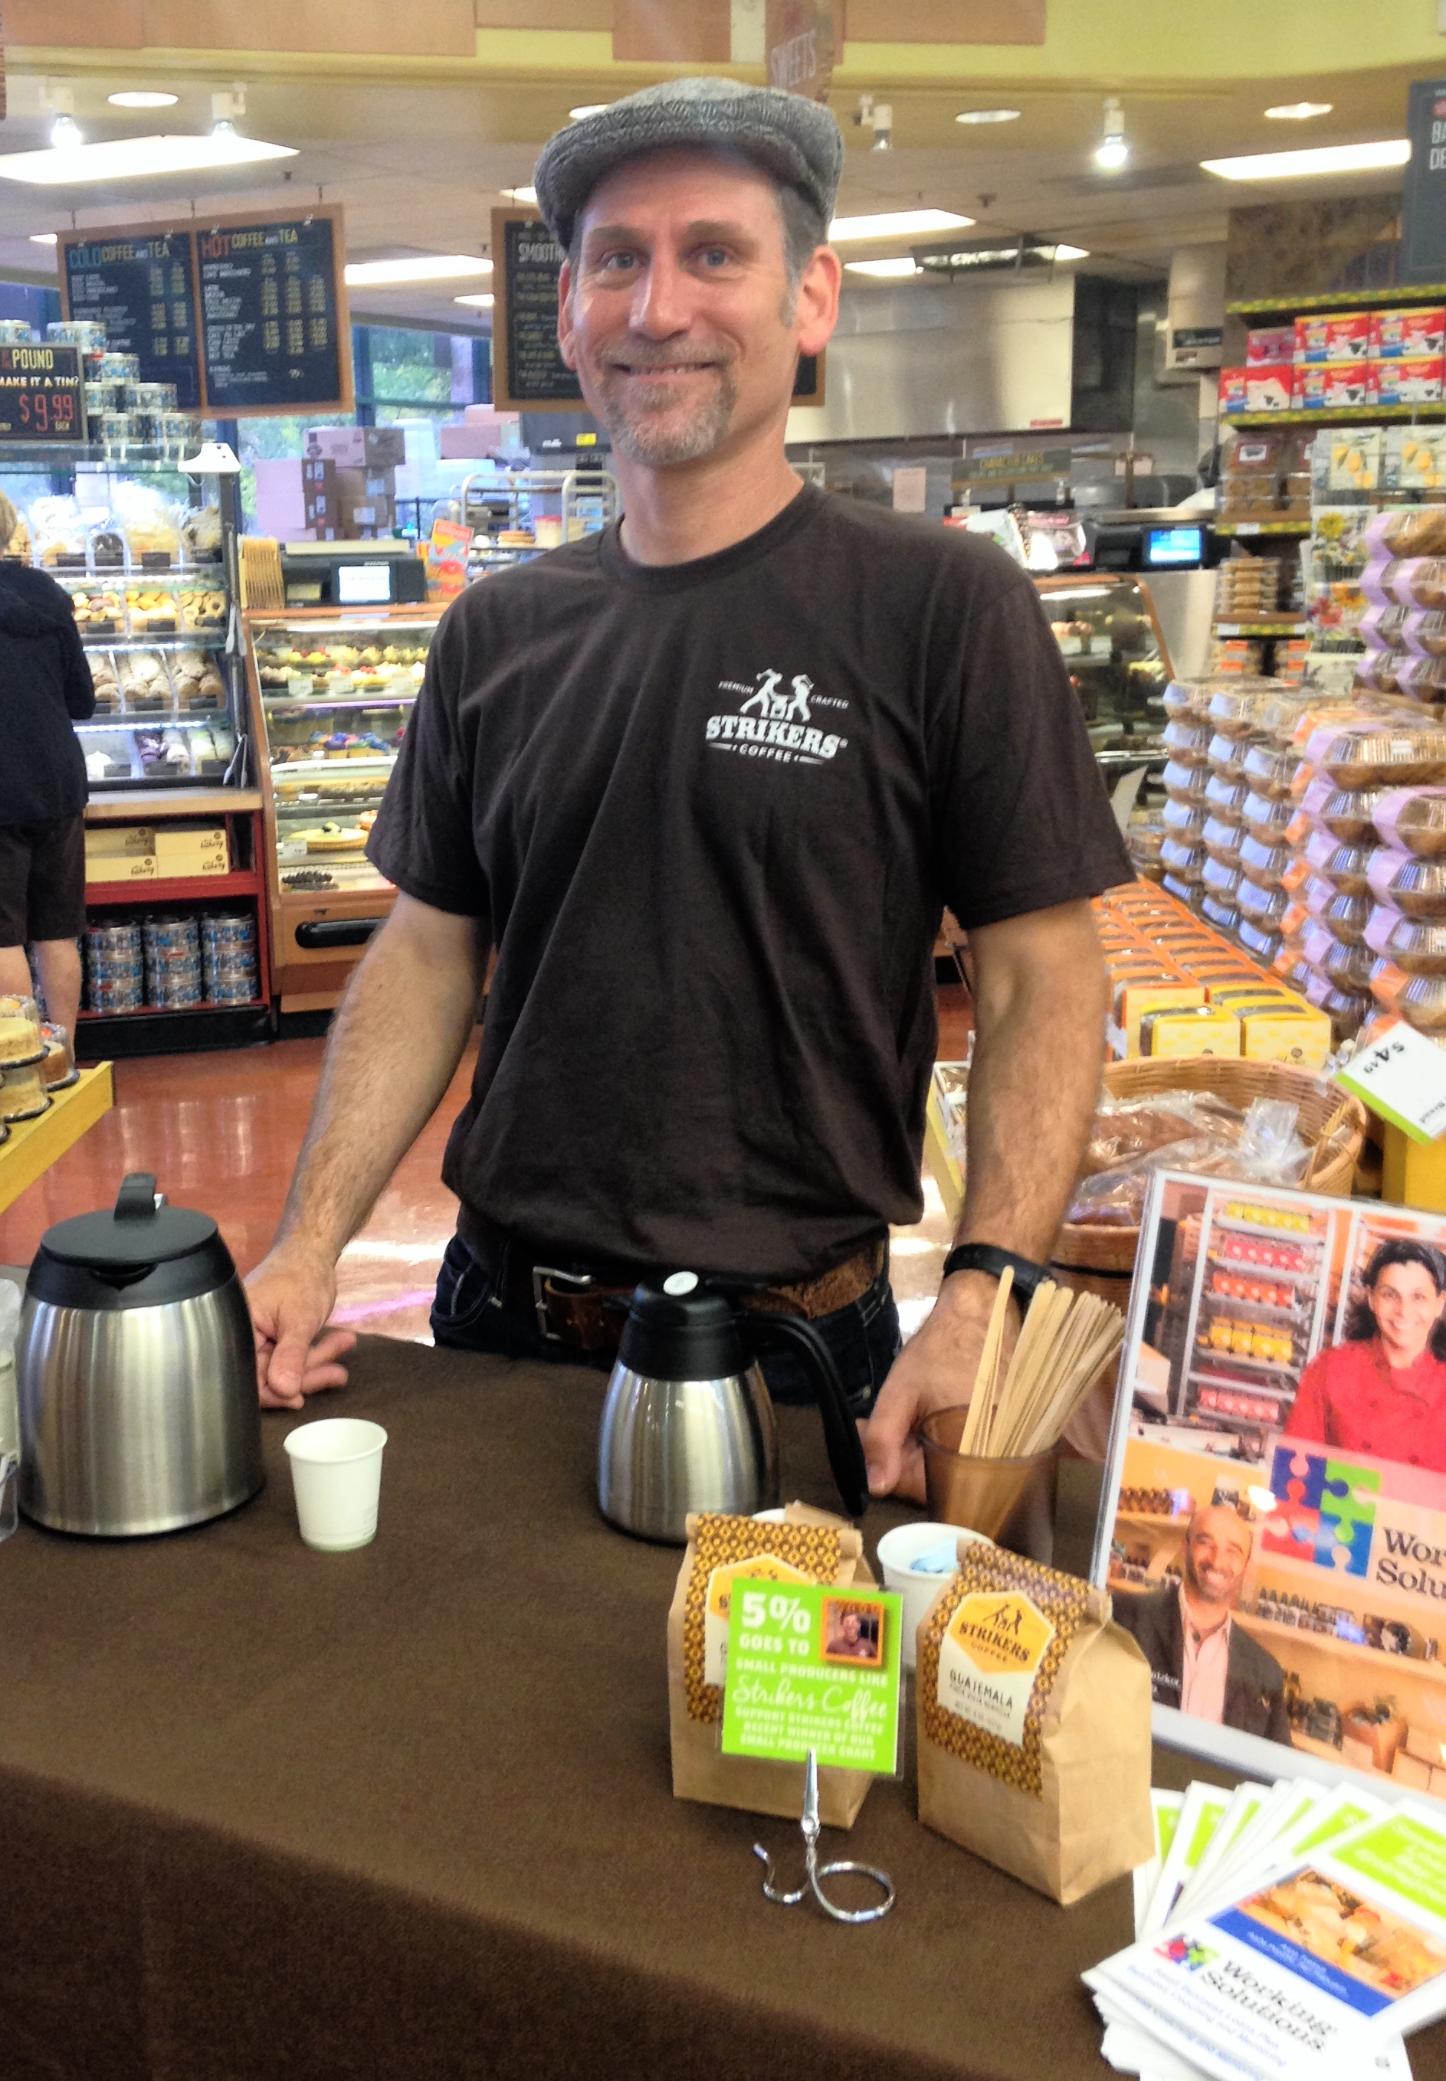 Grantwinner Jeff of Striker's Coffee at Whole Foods in San Ramon